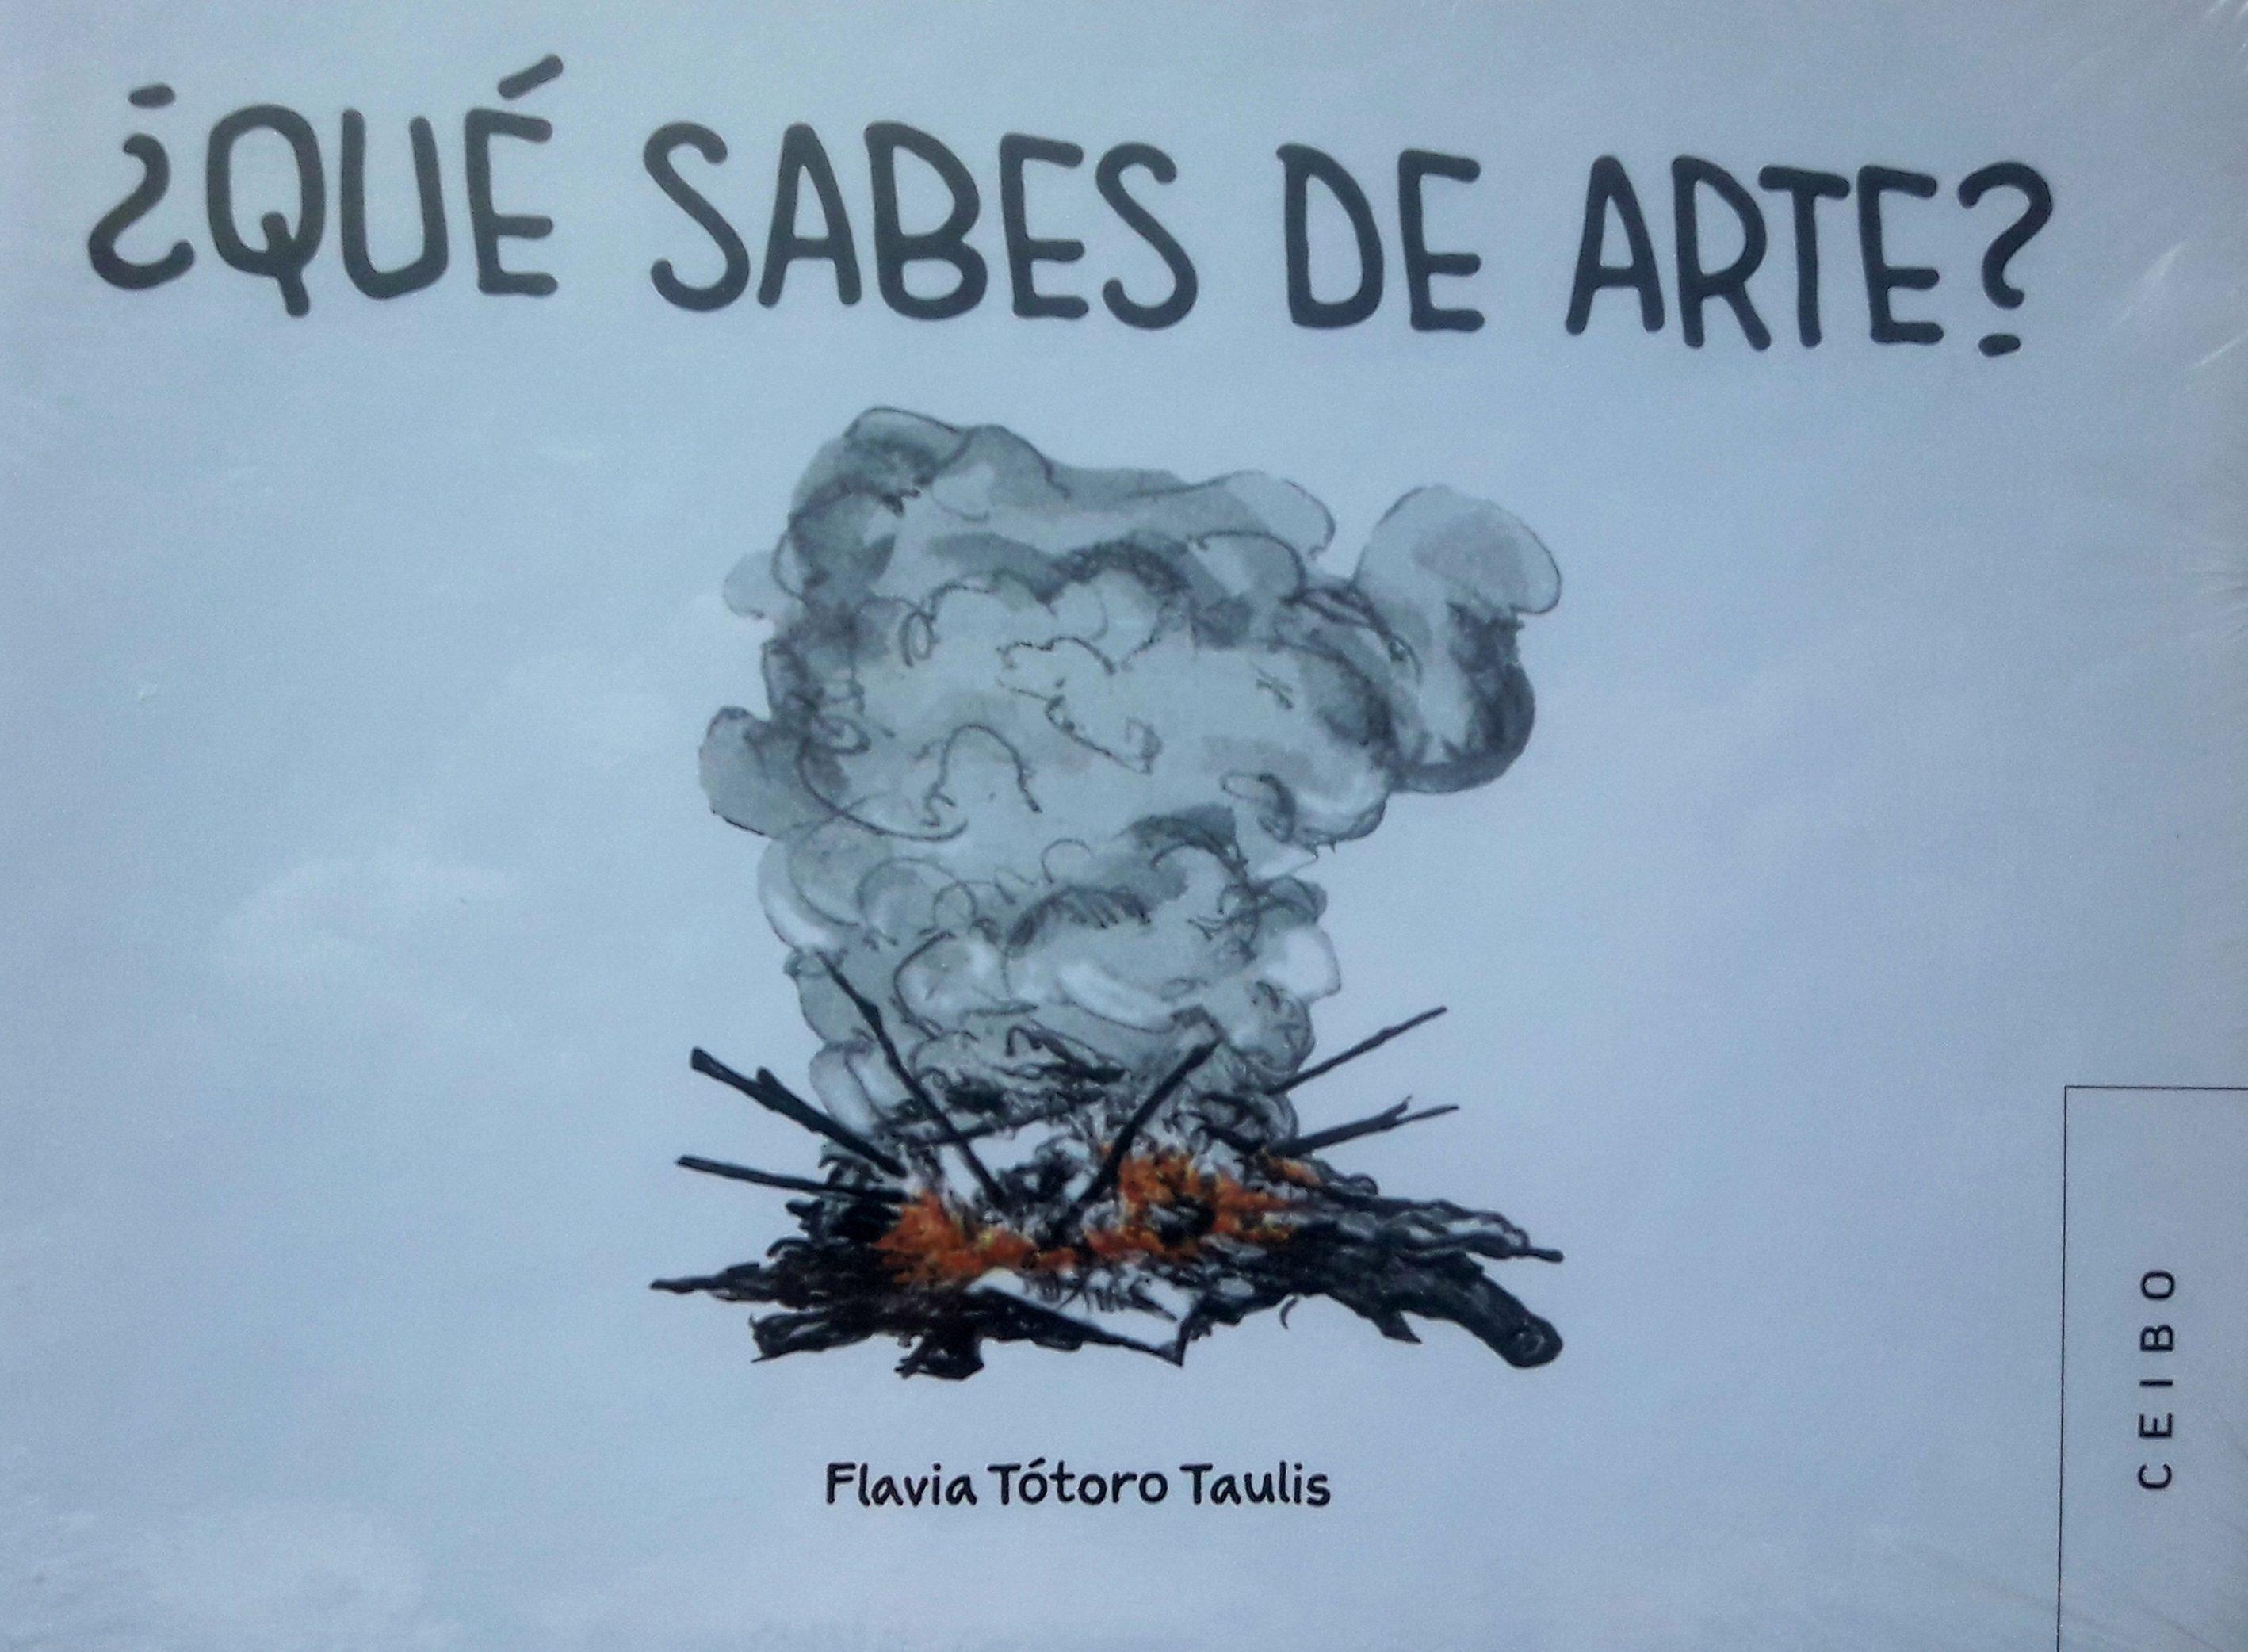 Flavia Tótoro Taulis: «¡Qué sabes de arte?»